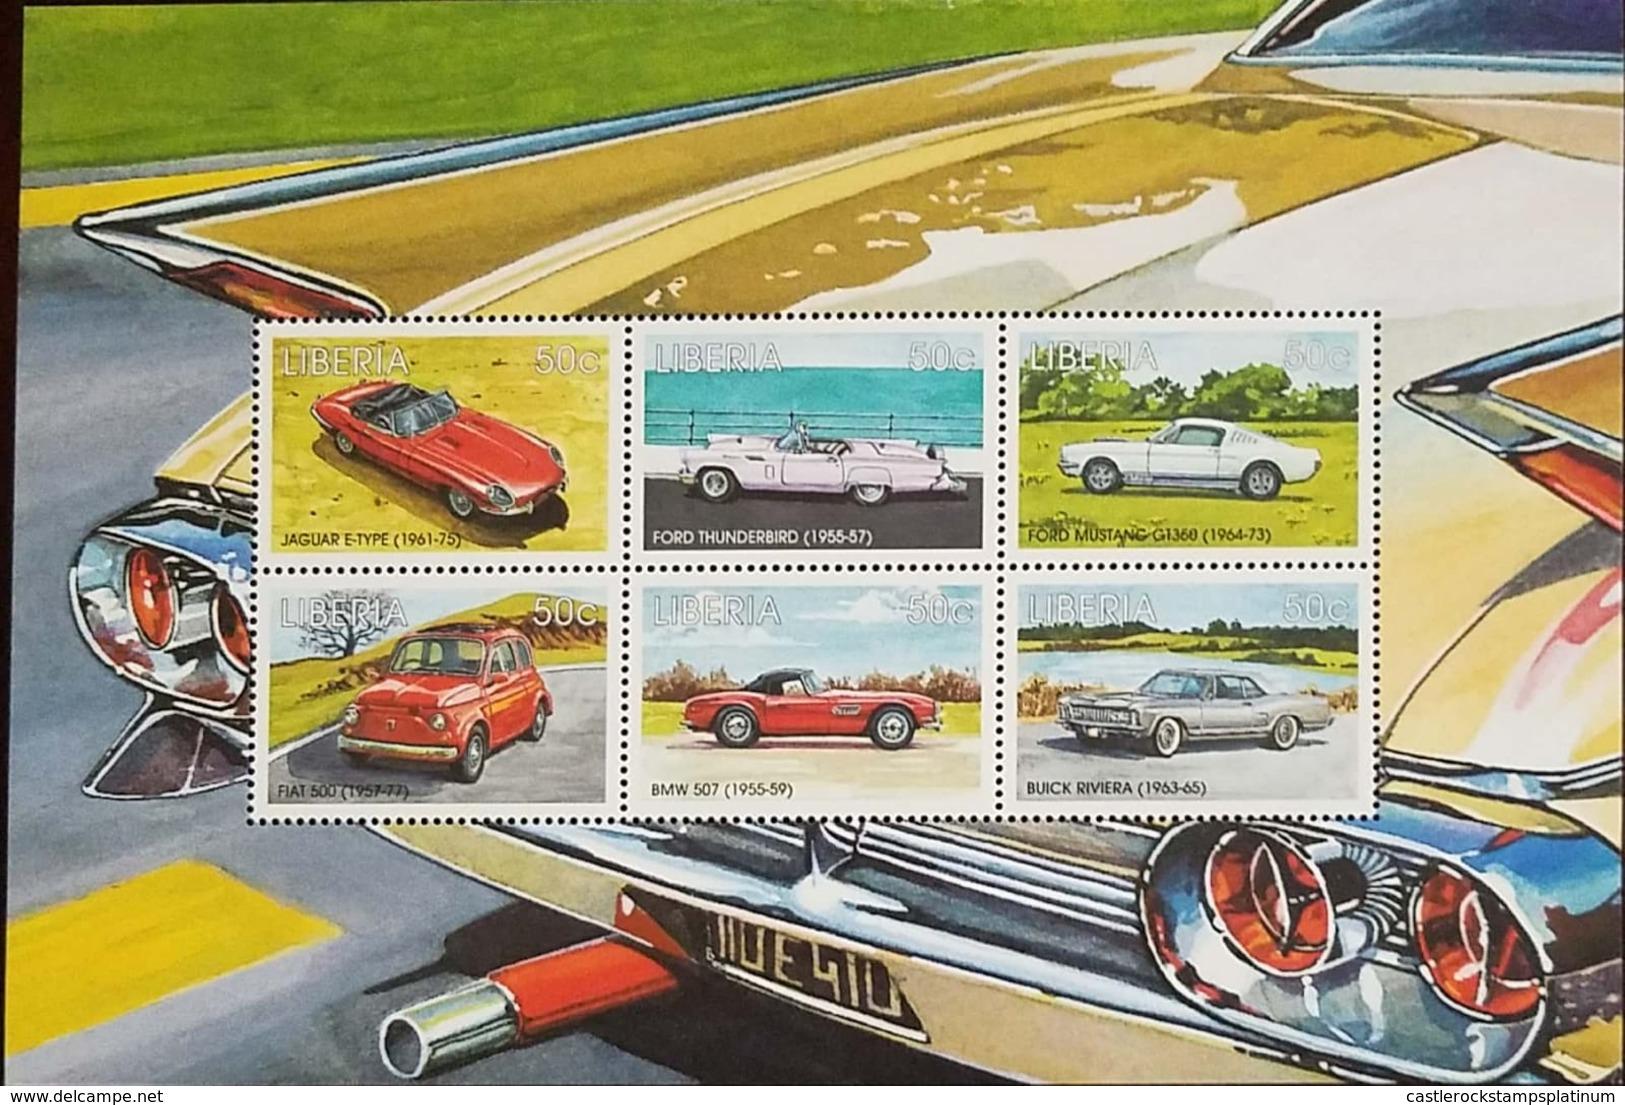 O) 2007 LIBERIA, OLD CARS - JAGUAR E-TYPE 1961 - FORD 1955 - FIAT 500 1957 - BMW 507, SOUVENIR MNH - Liberia